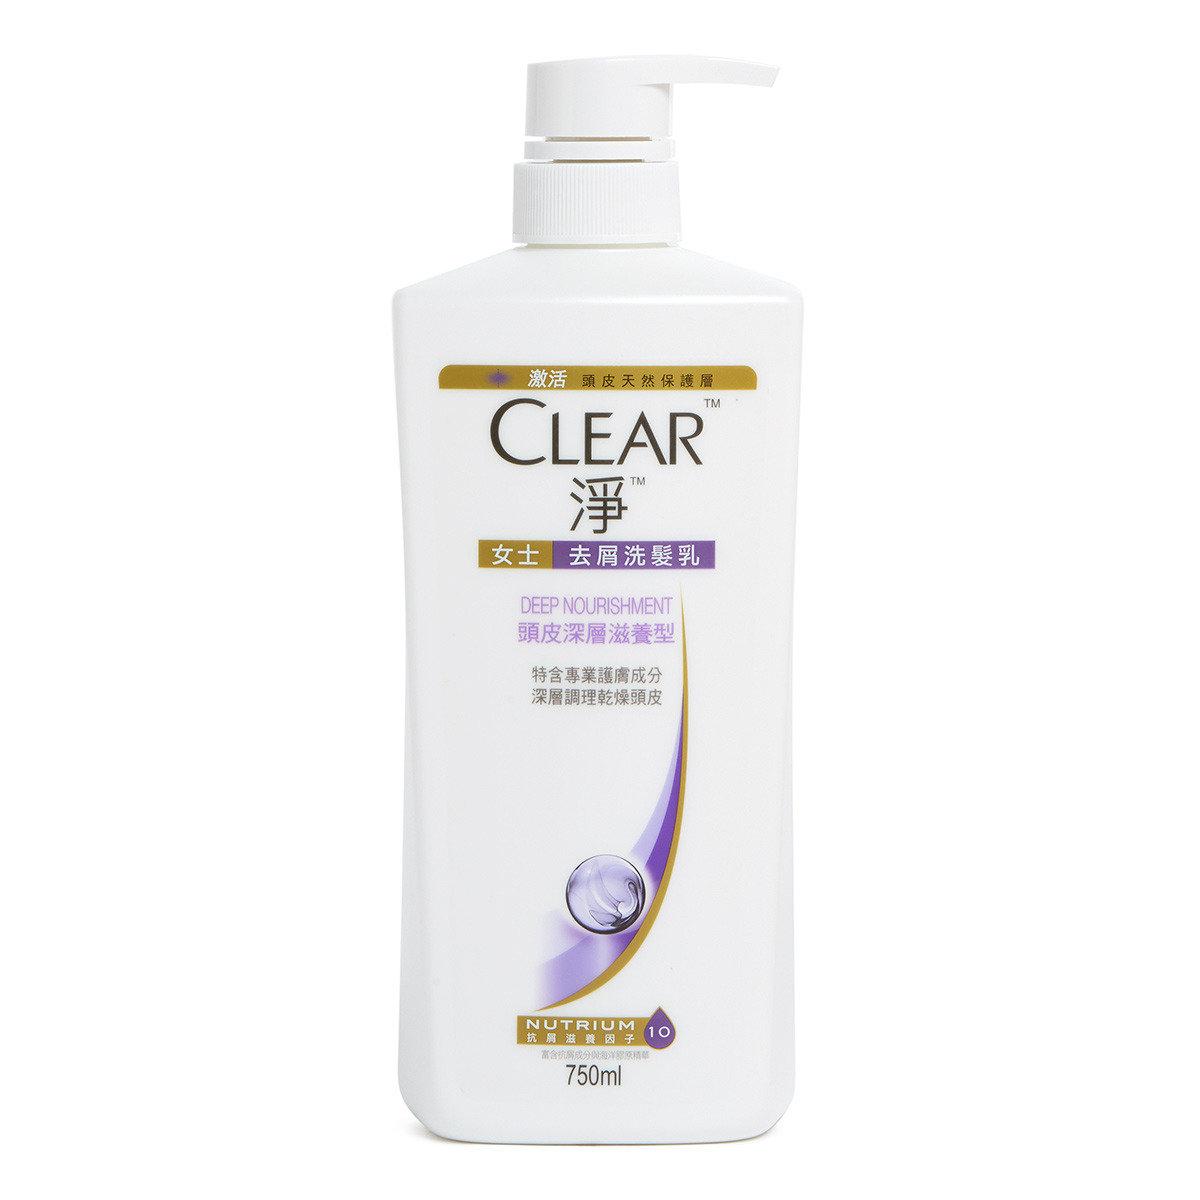 CLEAR 淨 頭皮深層滋養型去屑洗髮乳 (750毫升)